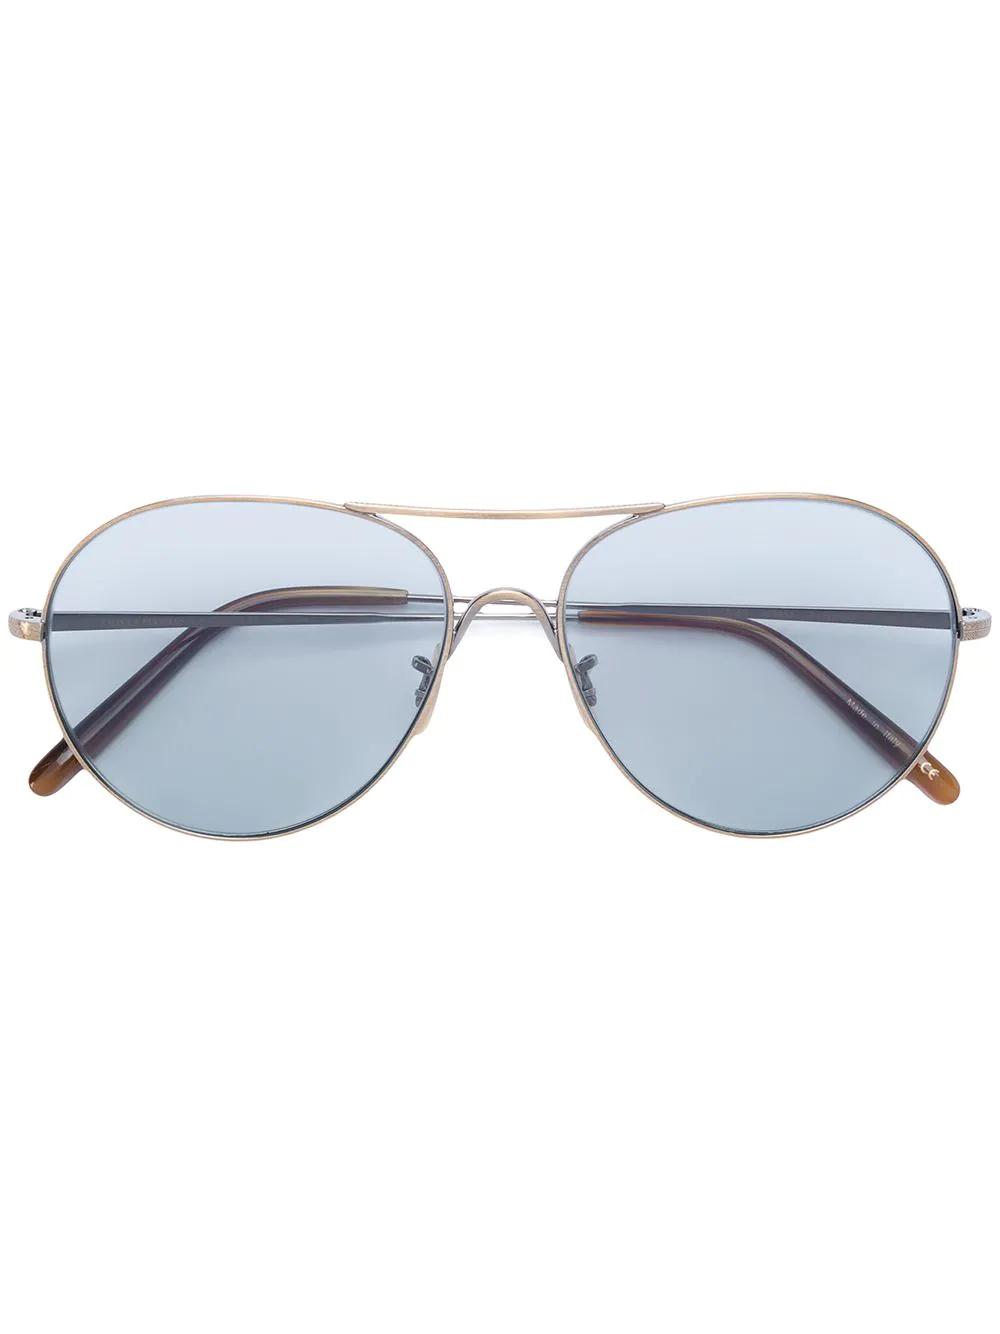 Oliver Peoples | солнцезащитные очки-авиаторы | Clouty